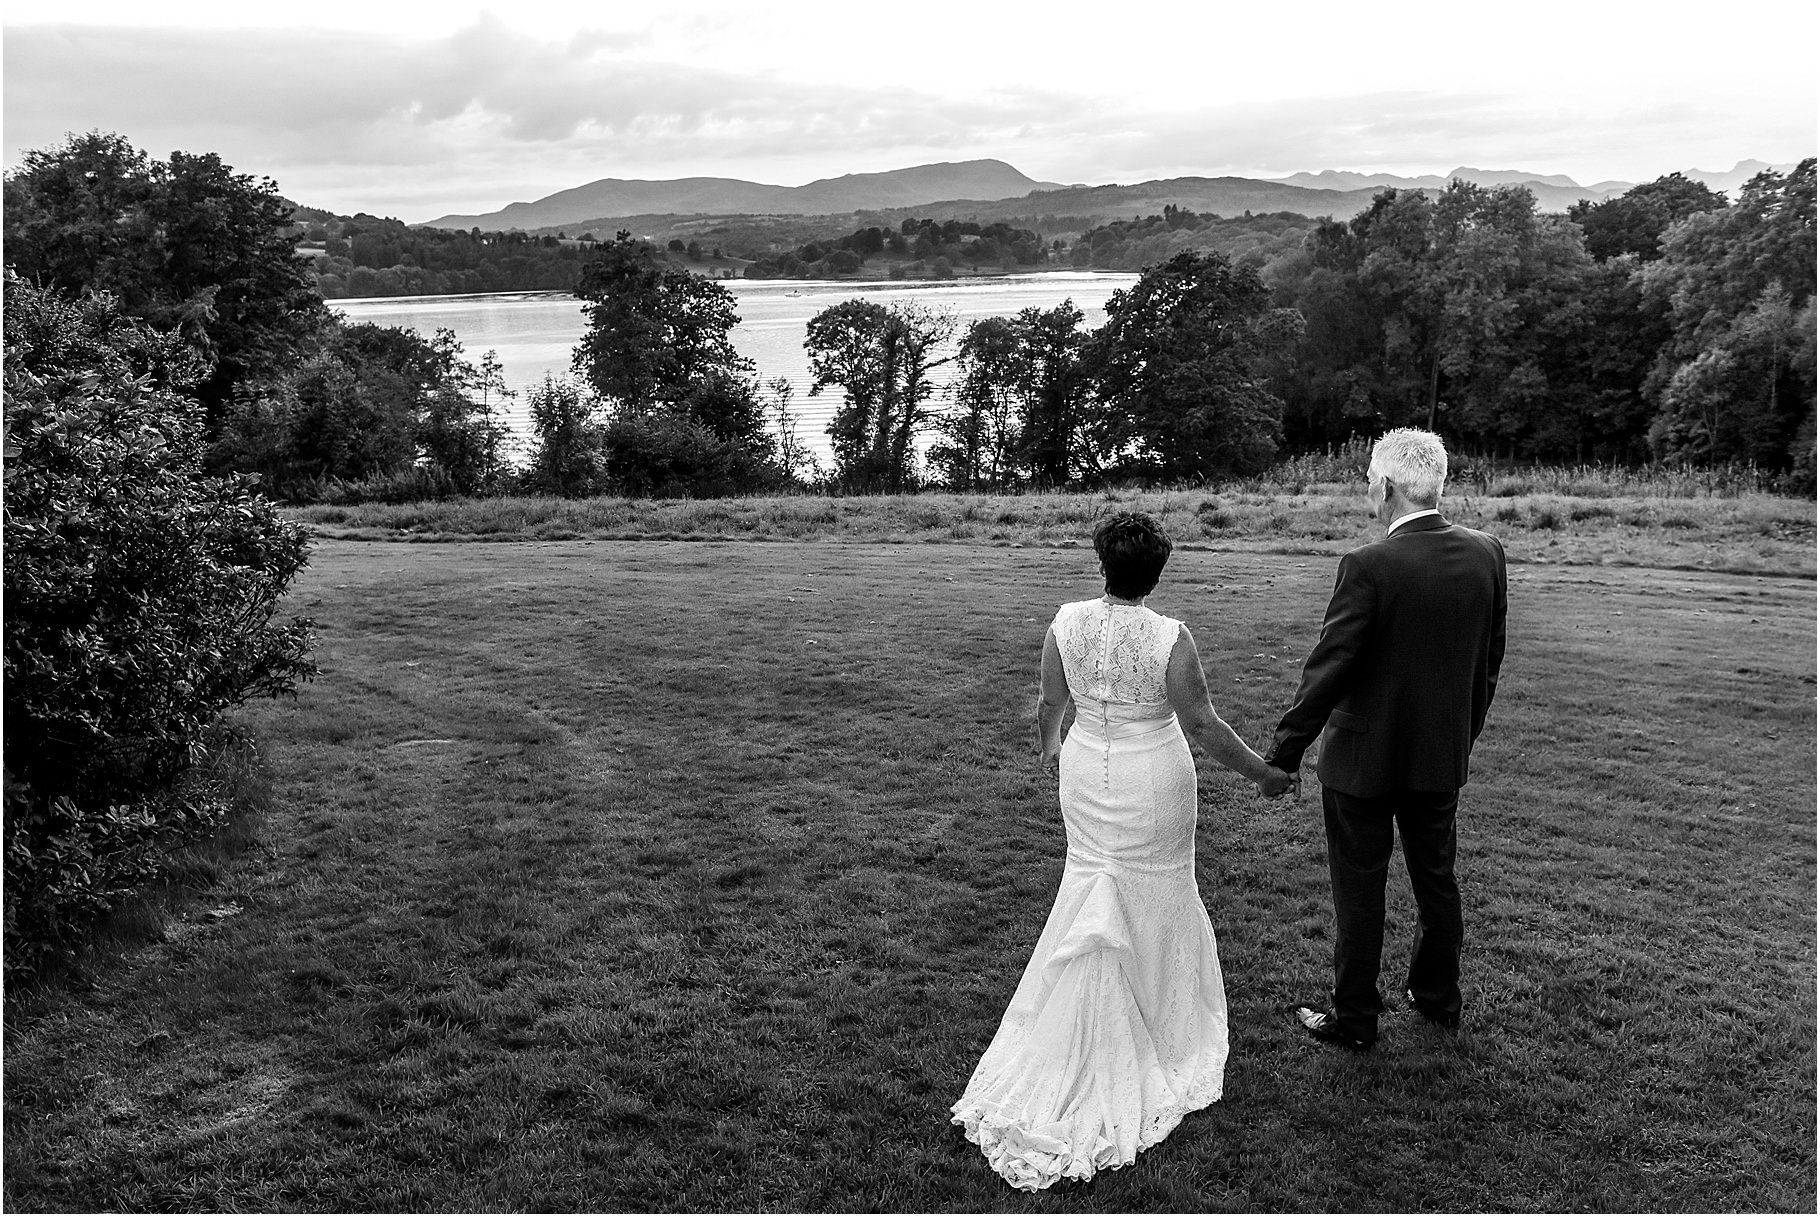 dan-wootton-photography-2017-weddings-011.jpg